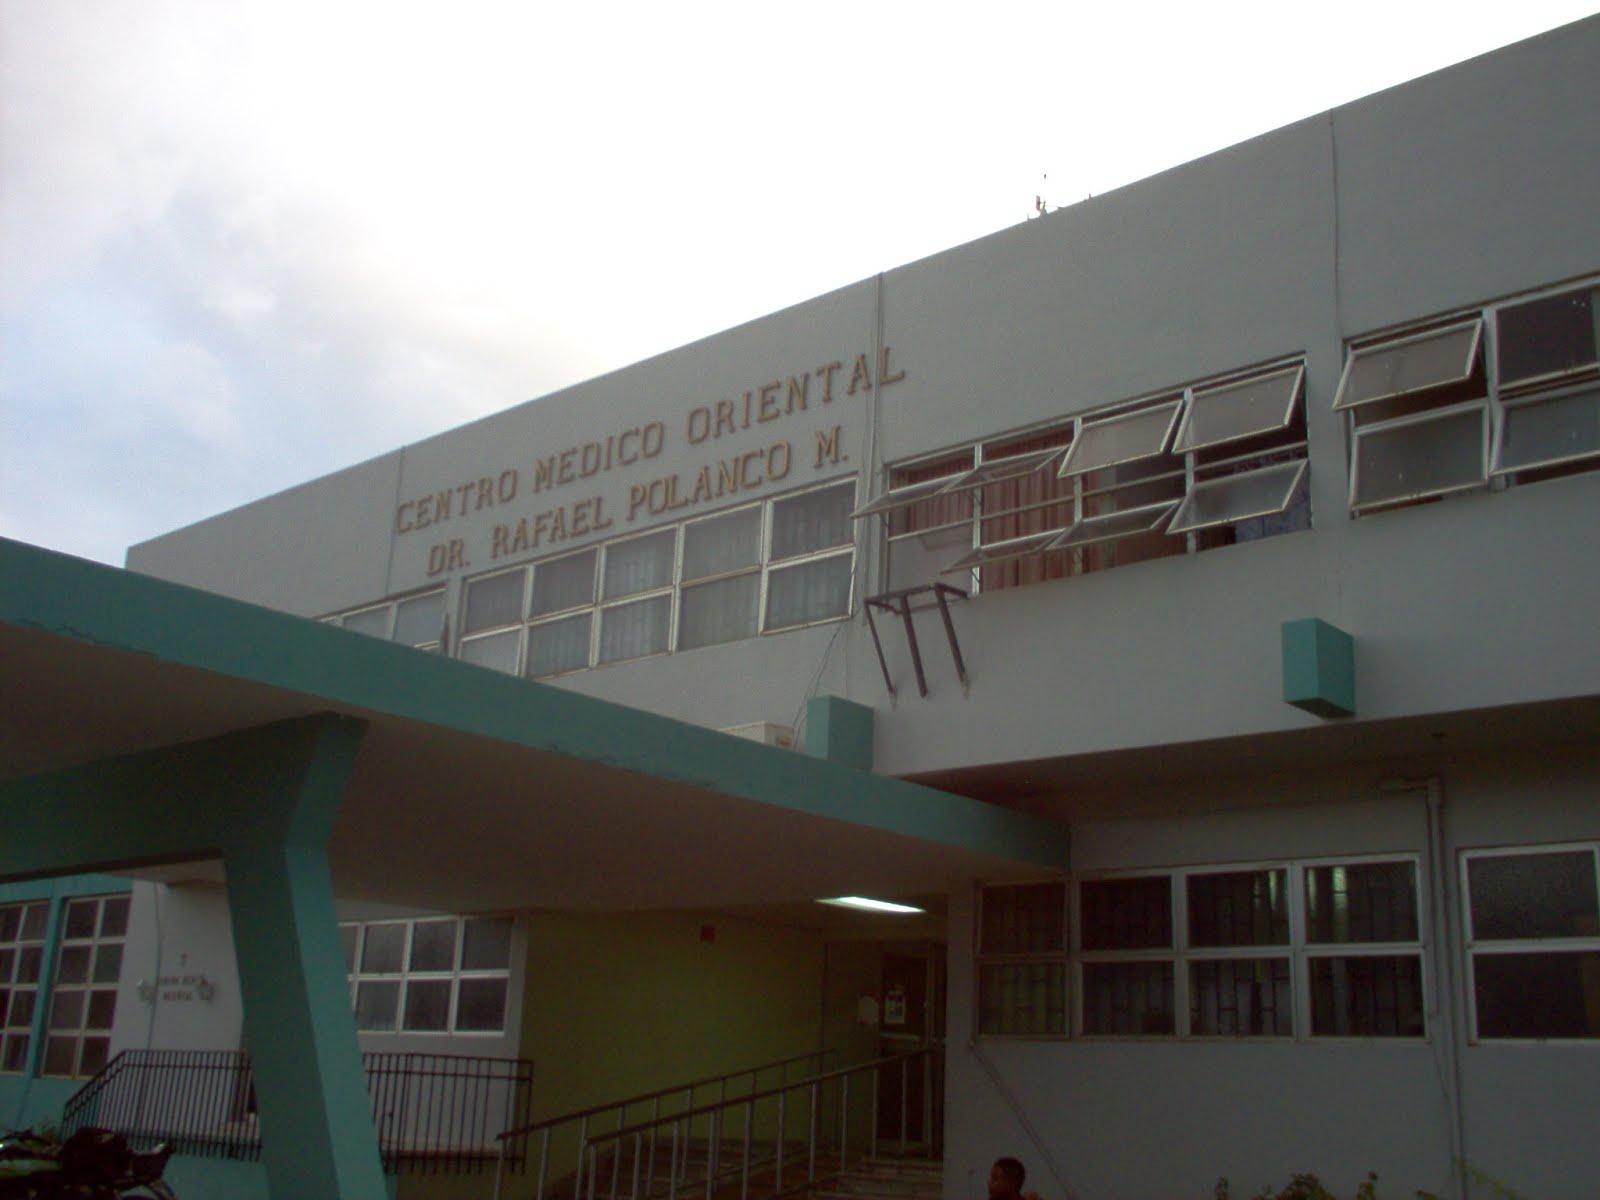 Centro Médico Oriental